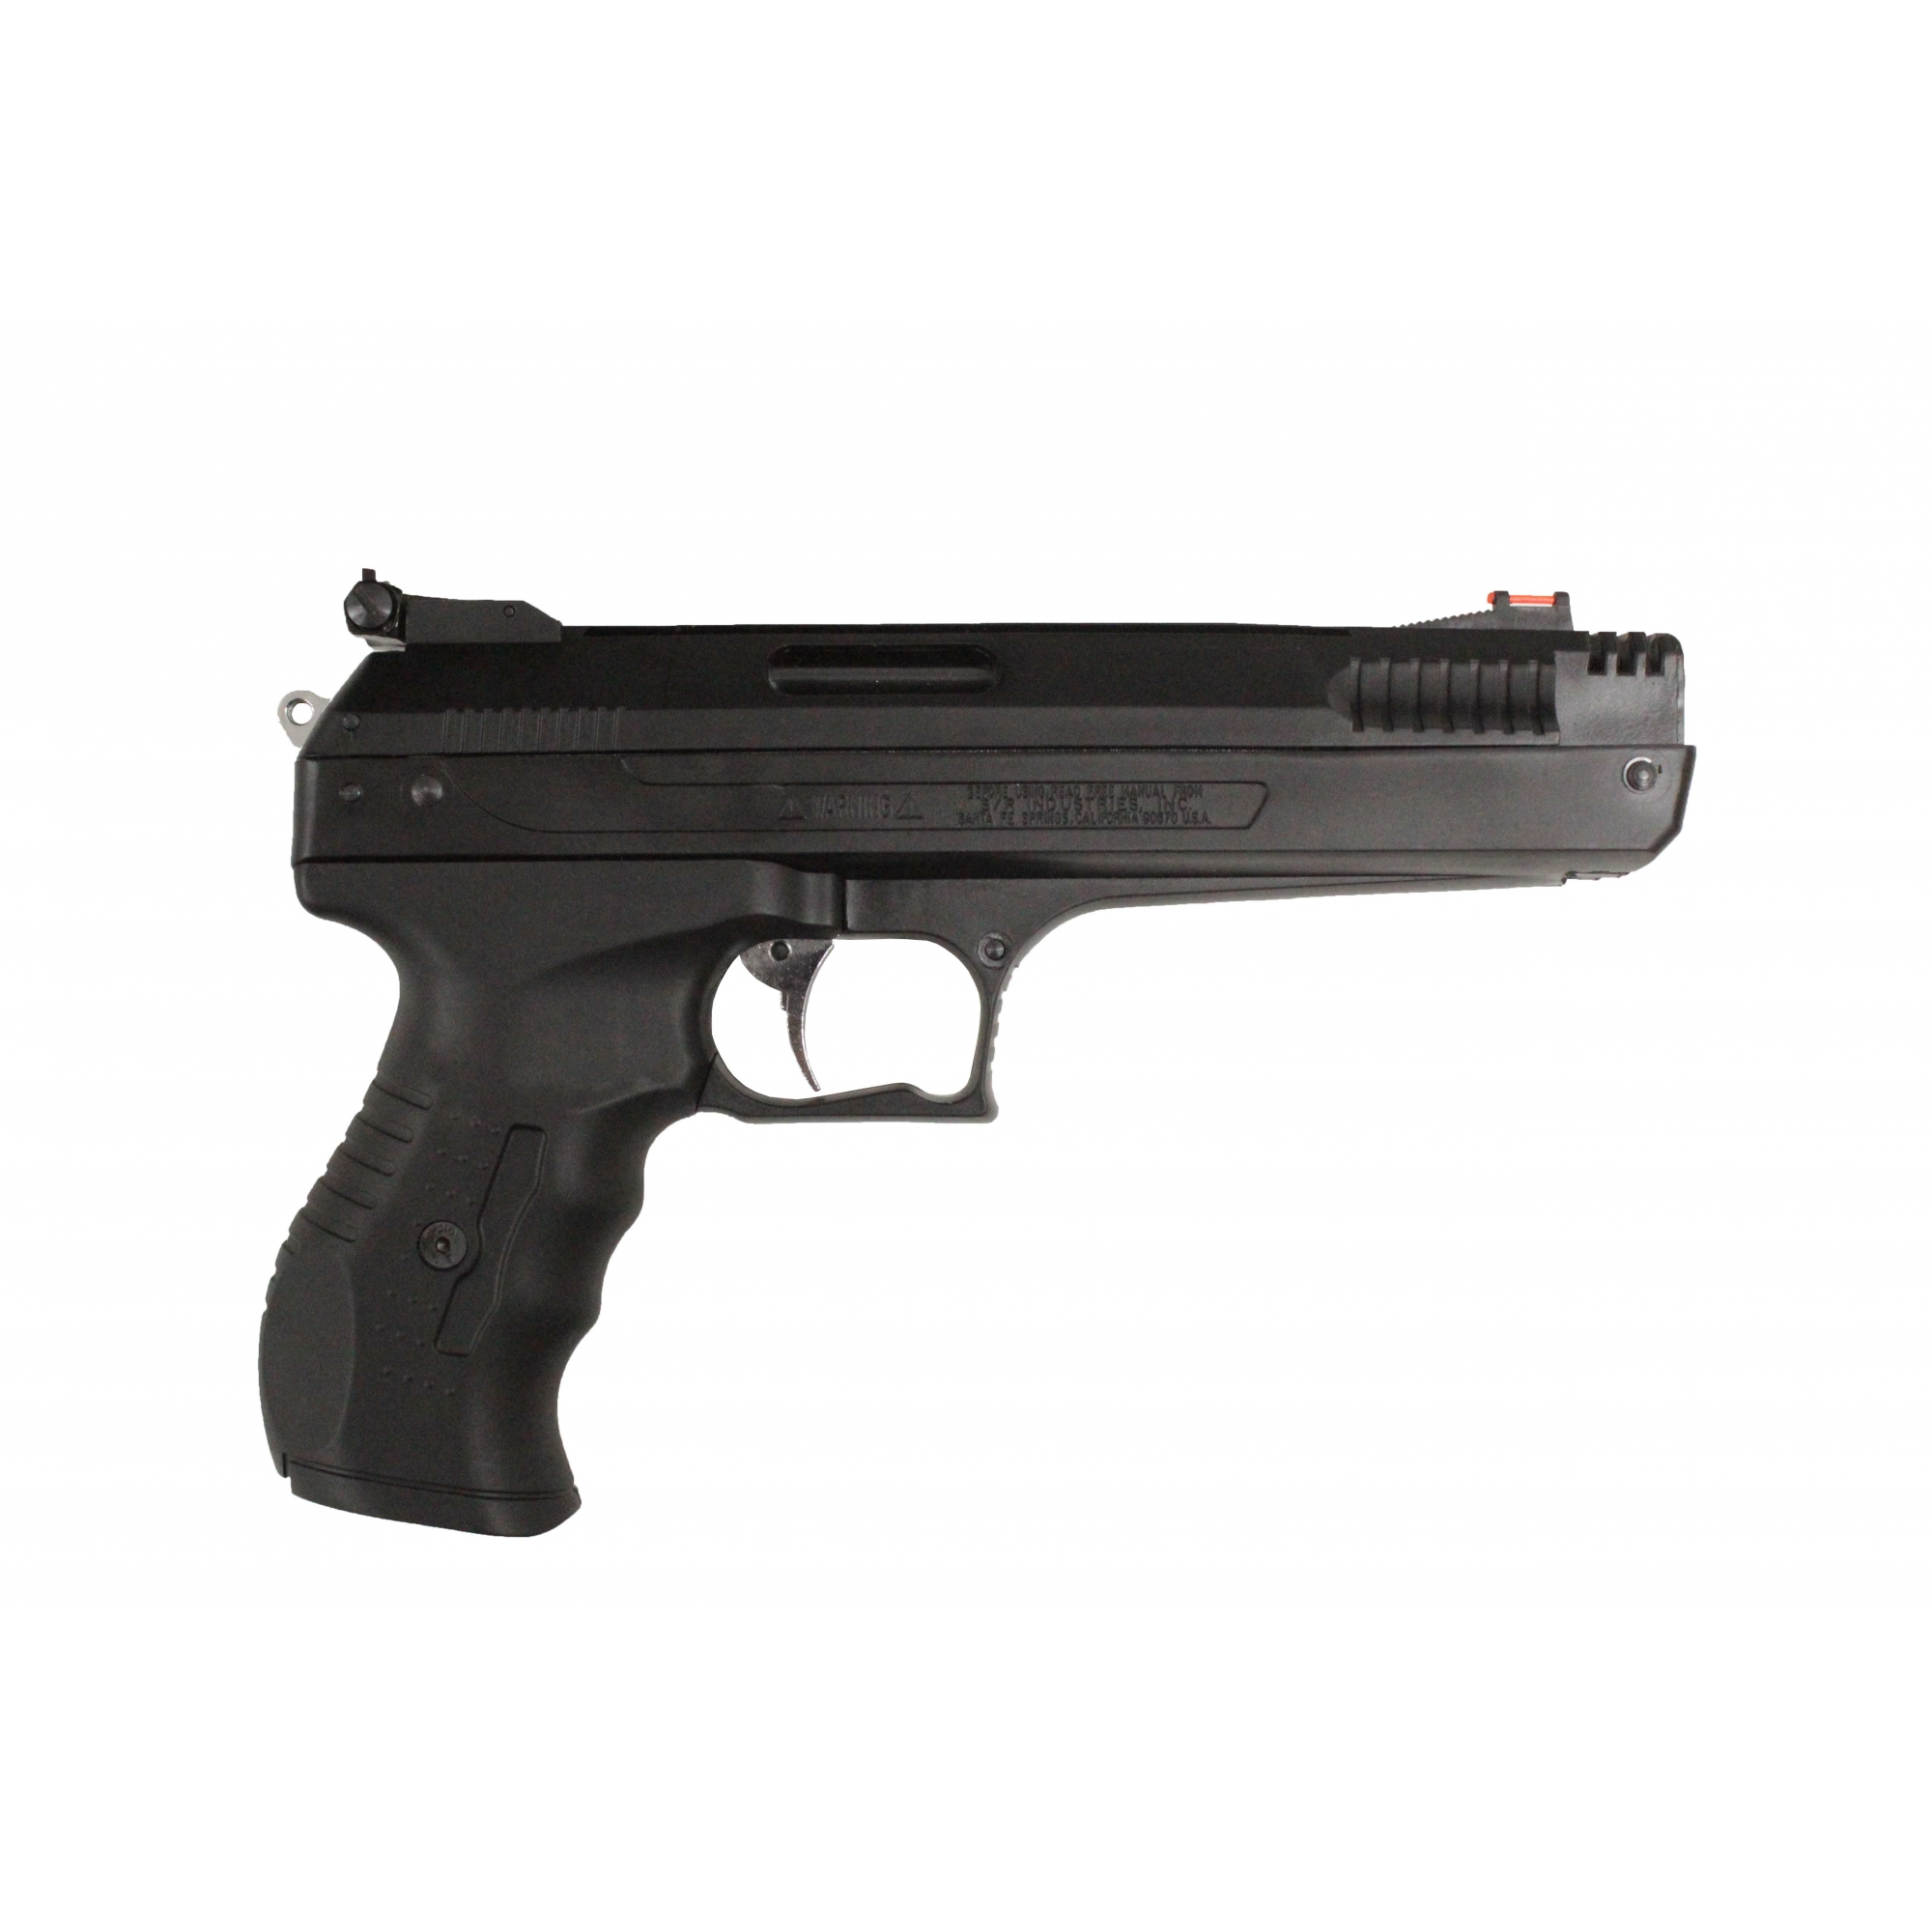 Pistola de Pressão Beeman 2004 5,5mm